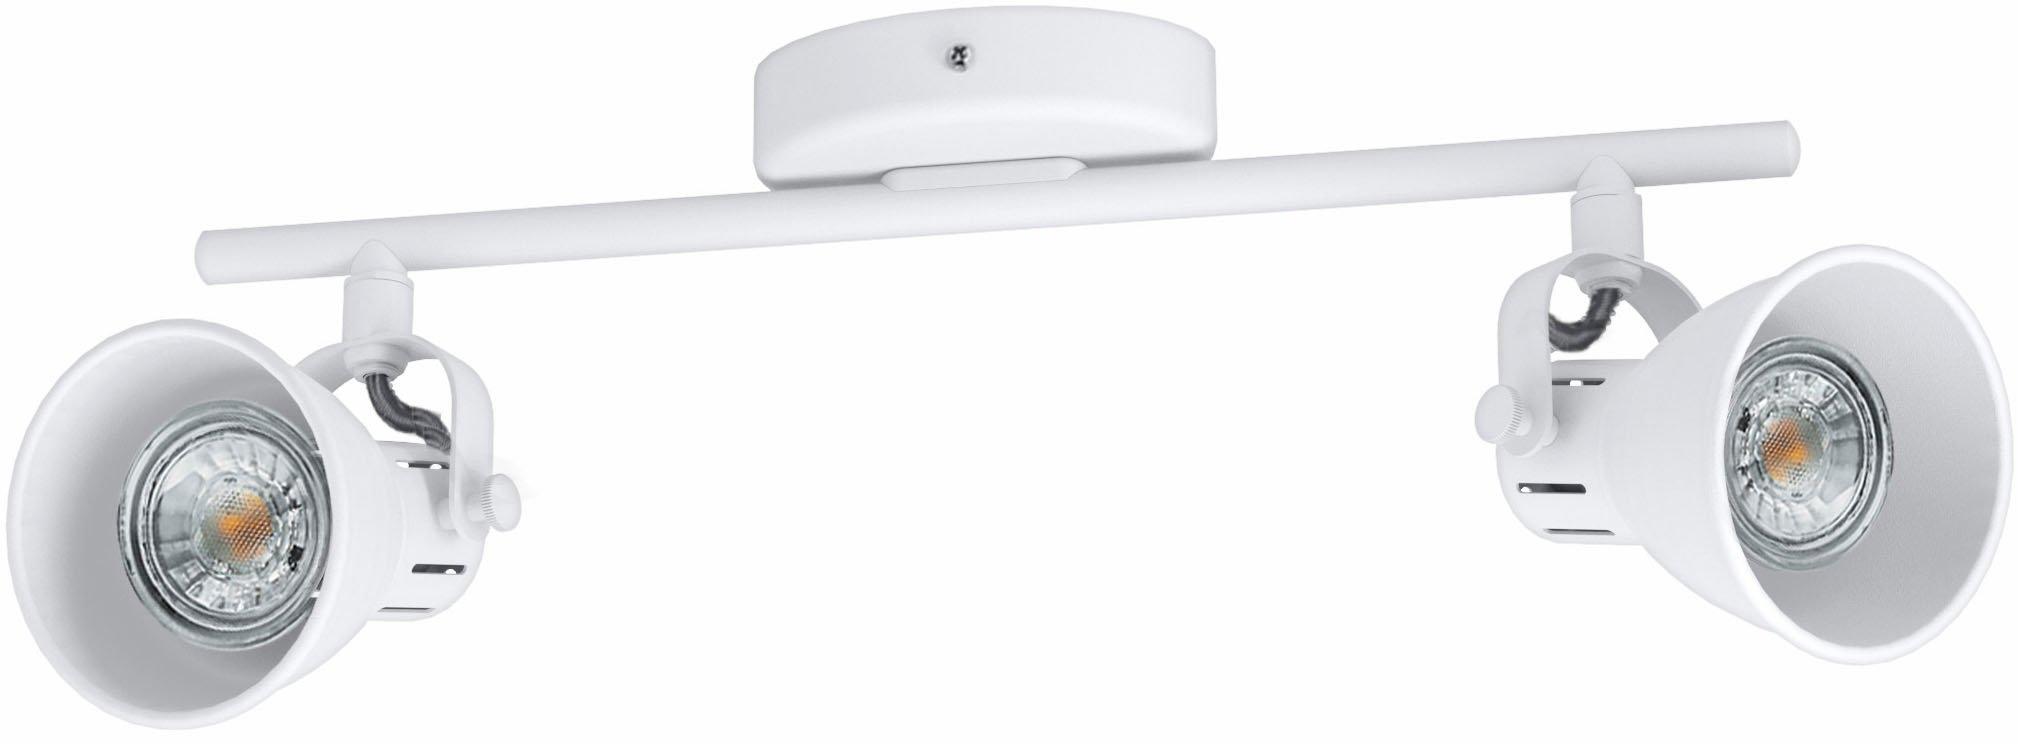 EGLO led-plafondspots SERAS 1 Led-plafondlamp voordelig en veilig online kopen